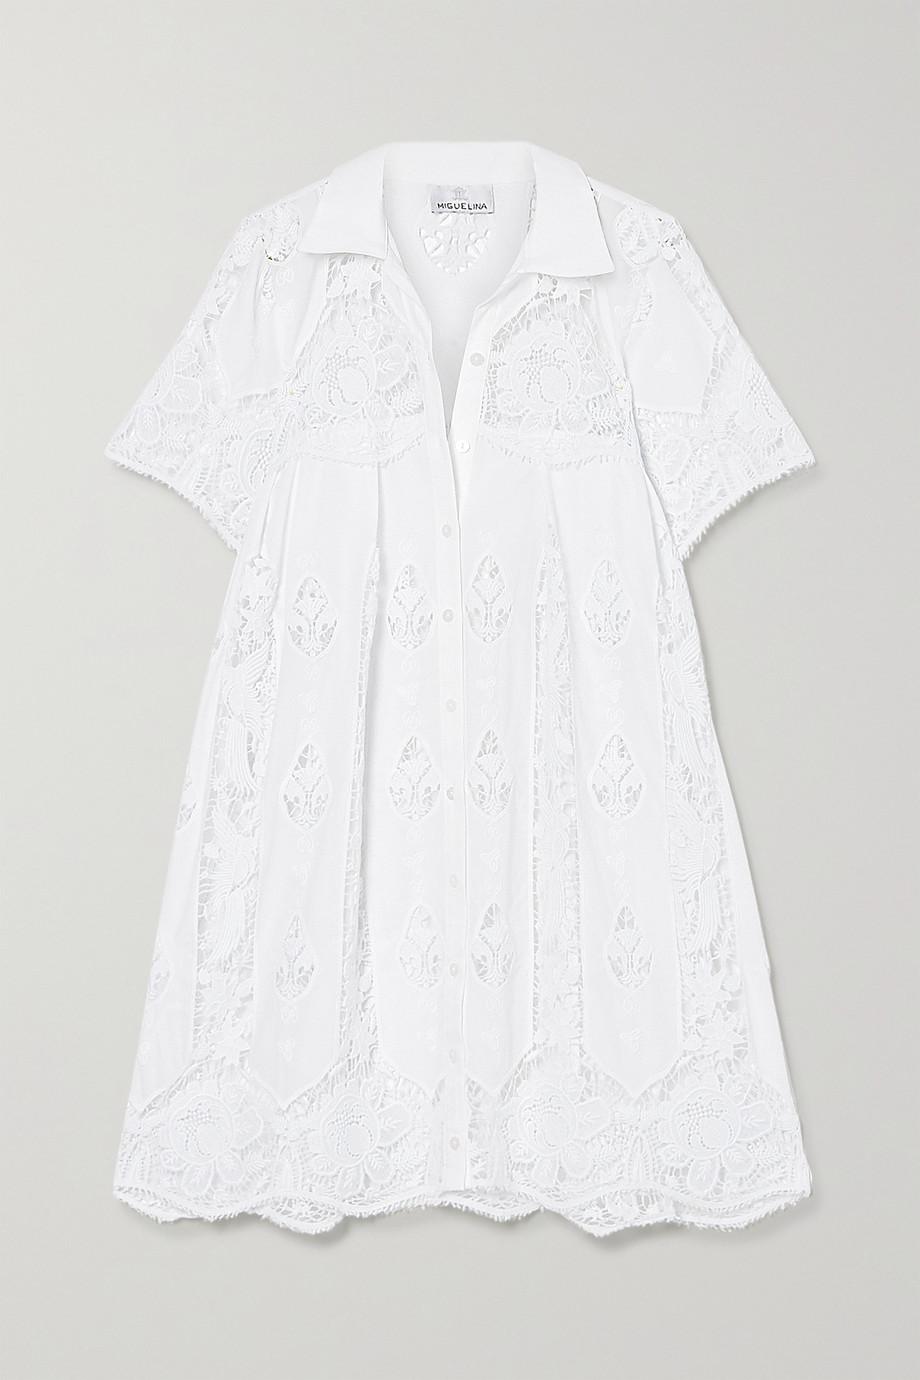 Miguelina Alanna crocheted cotton mini shirt dress